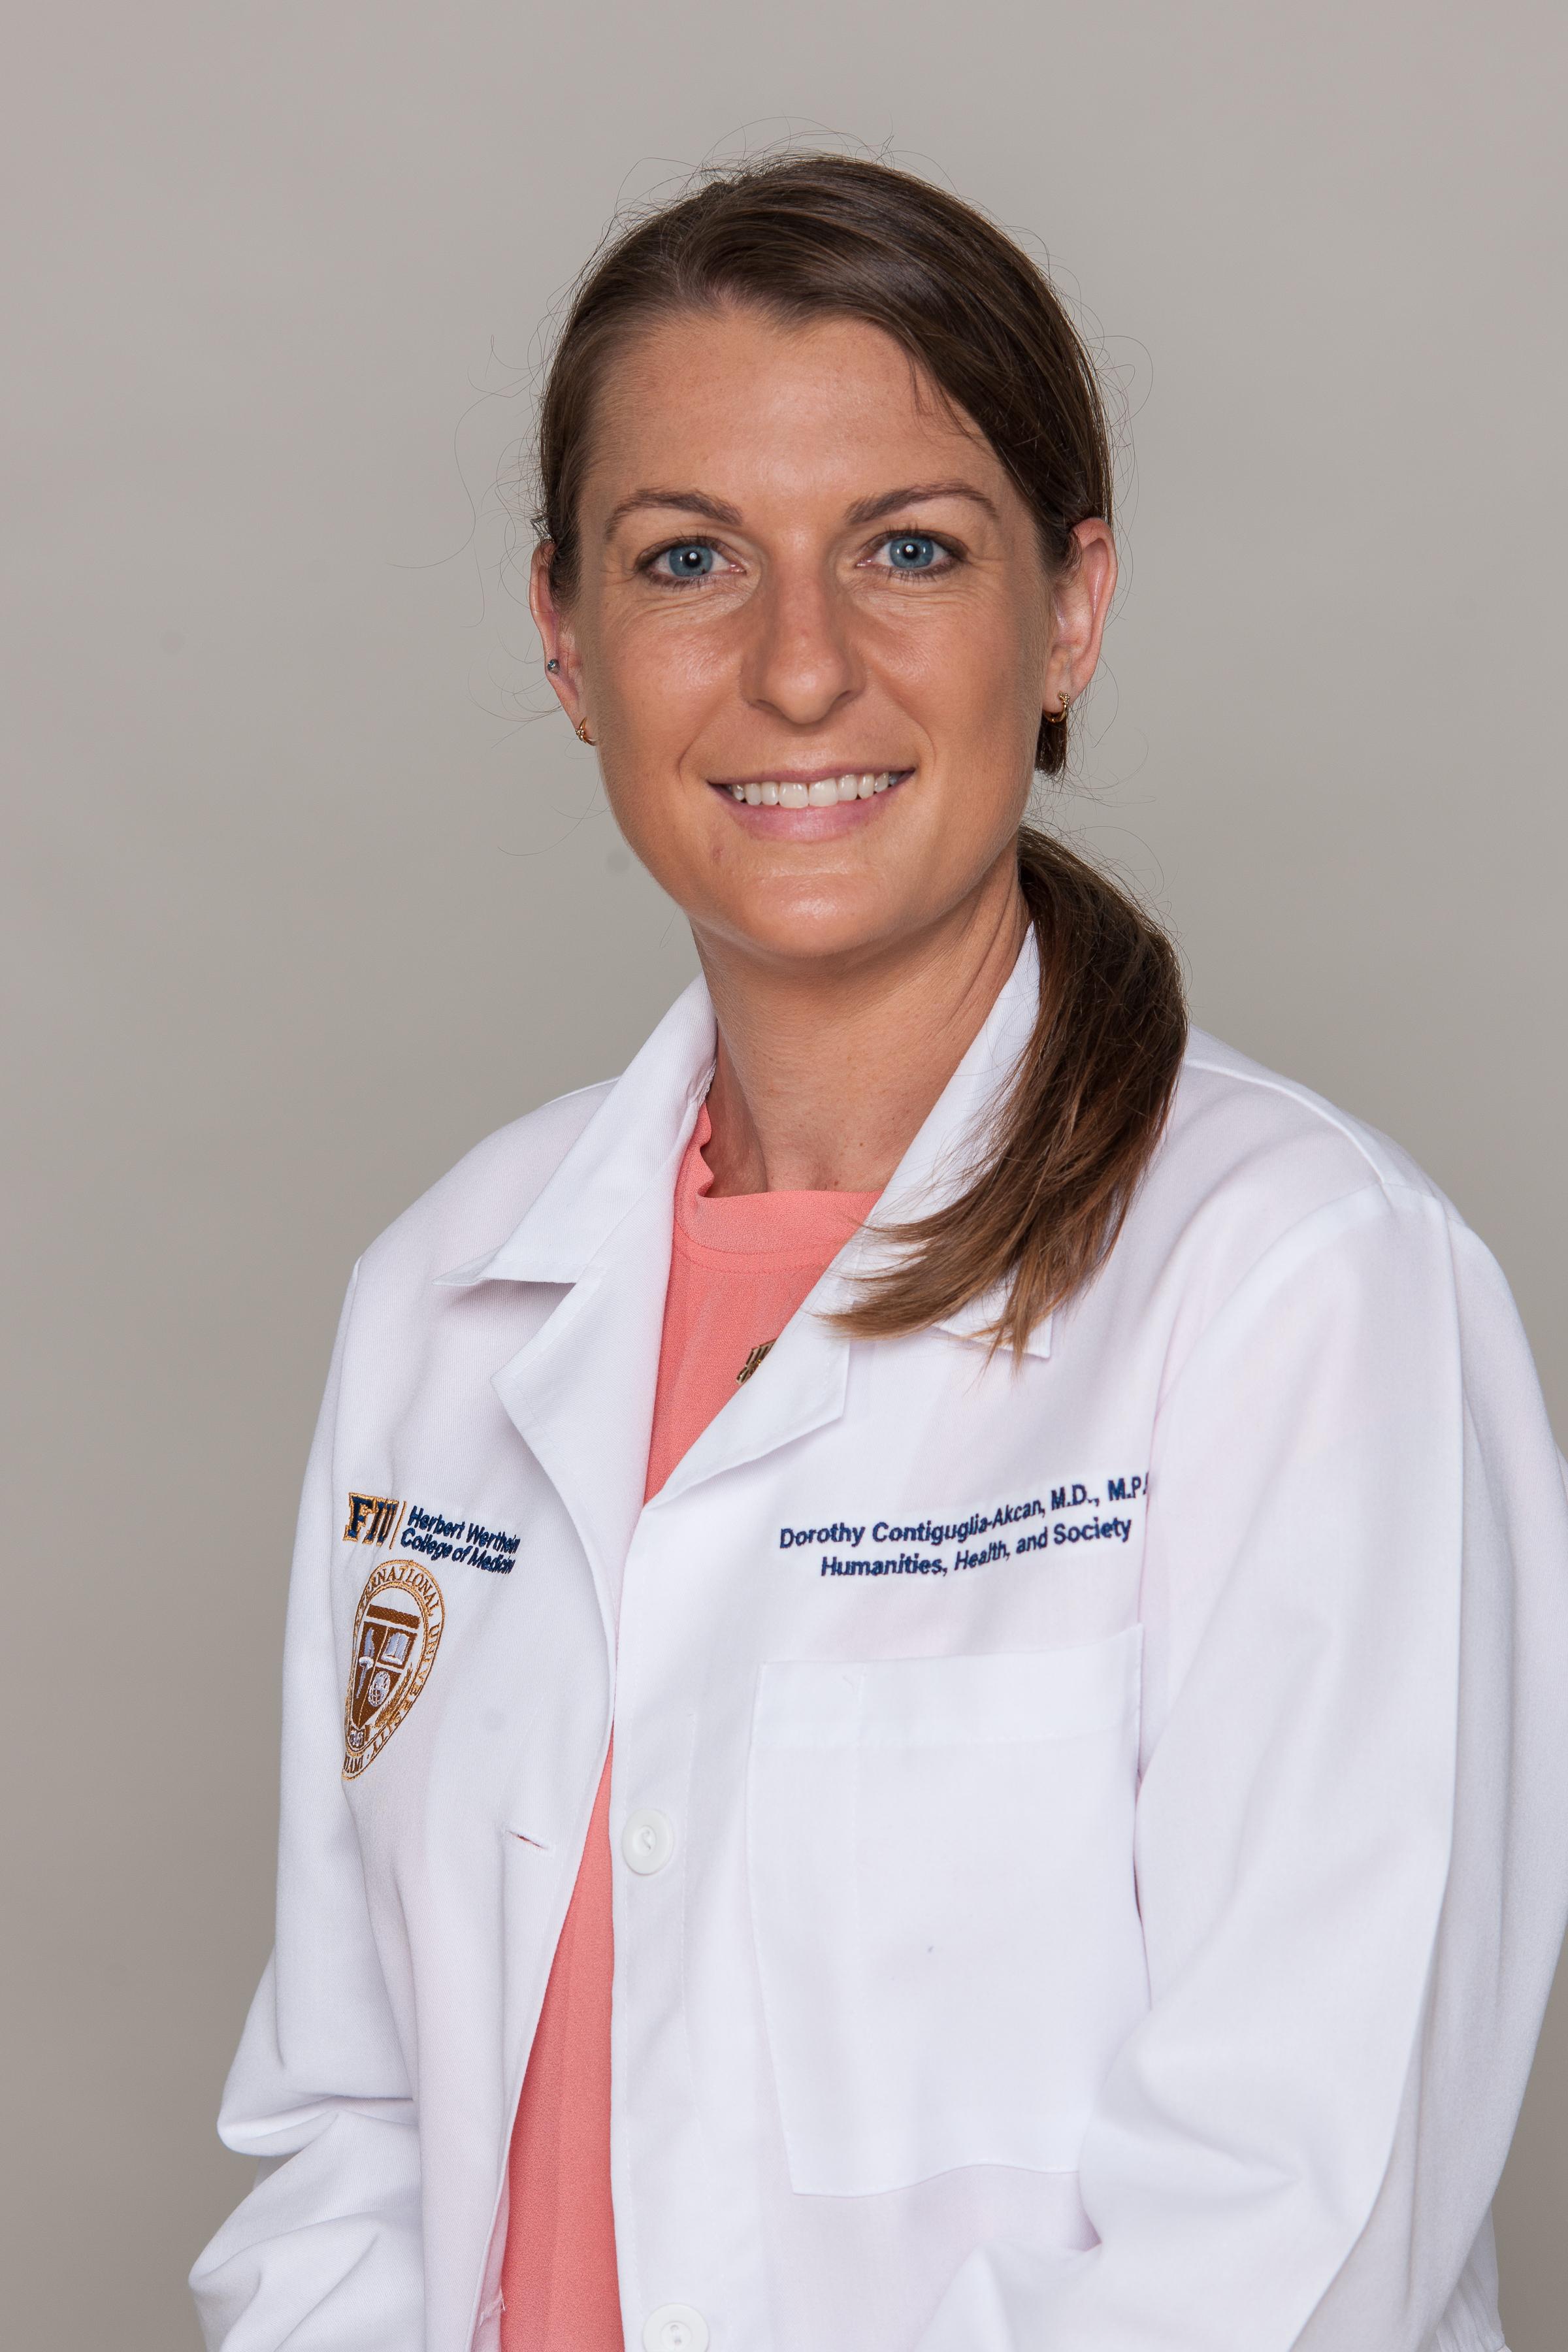 Dorothy Contiguglia-Akcan, M.D., FIU Health